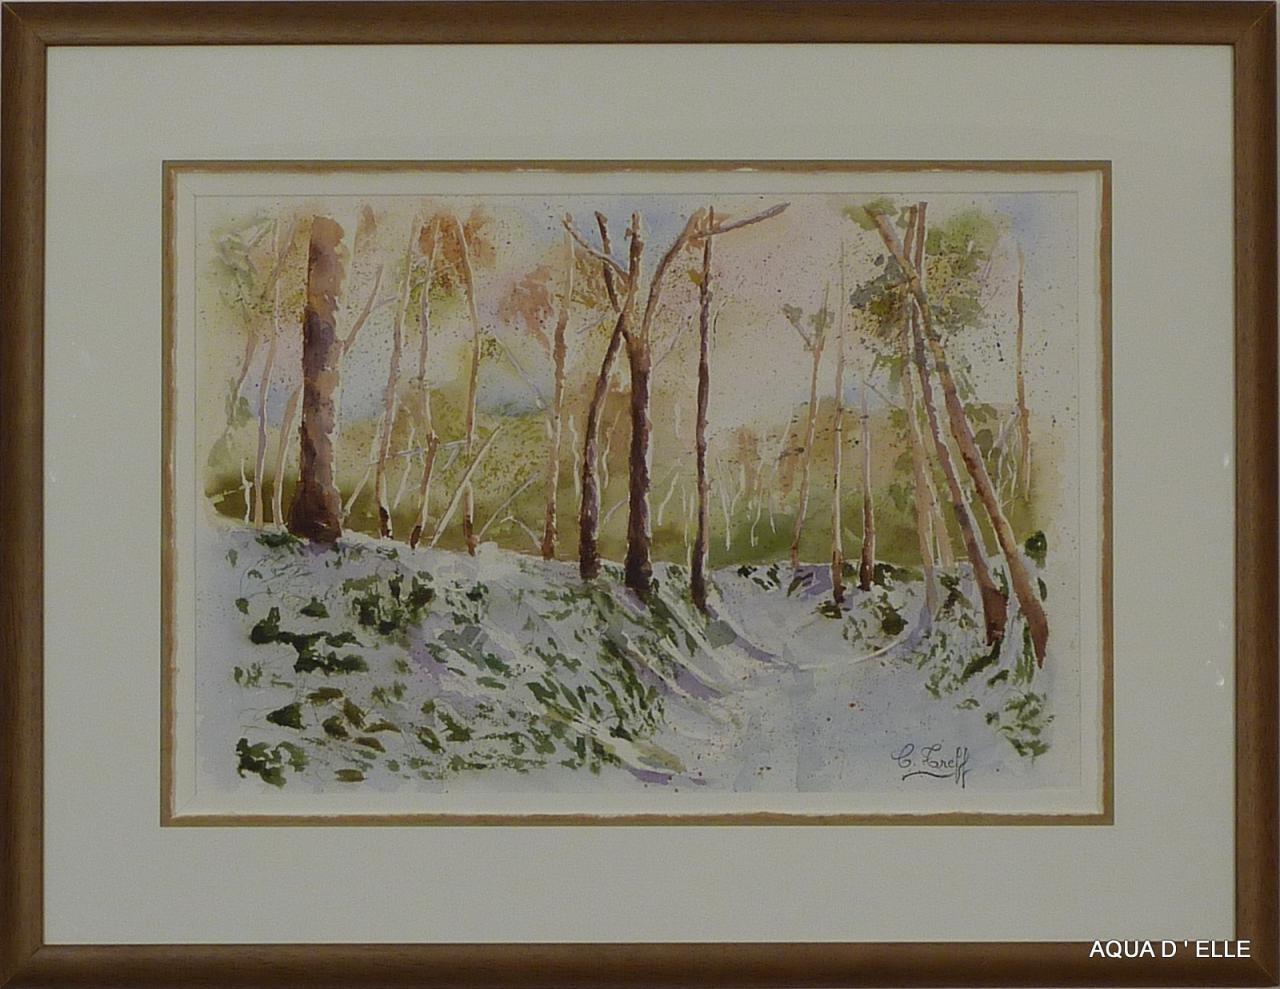 95-Un peu de neige-(63x48)